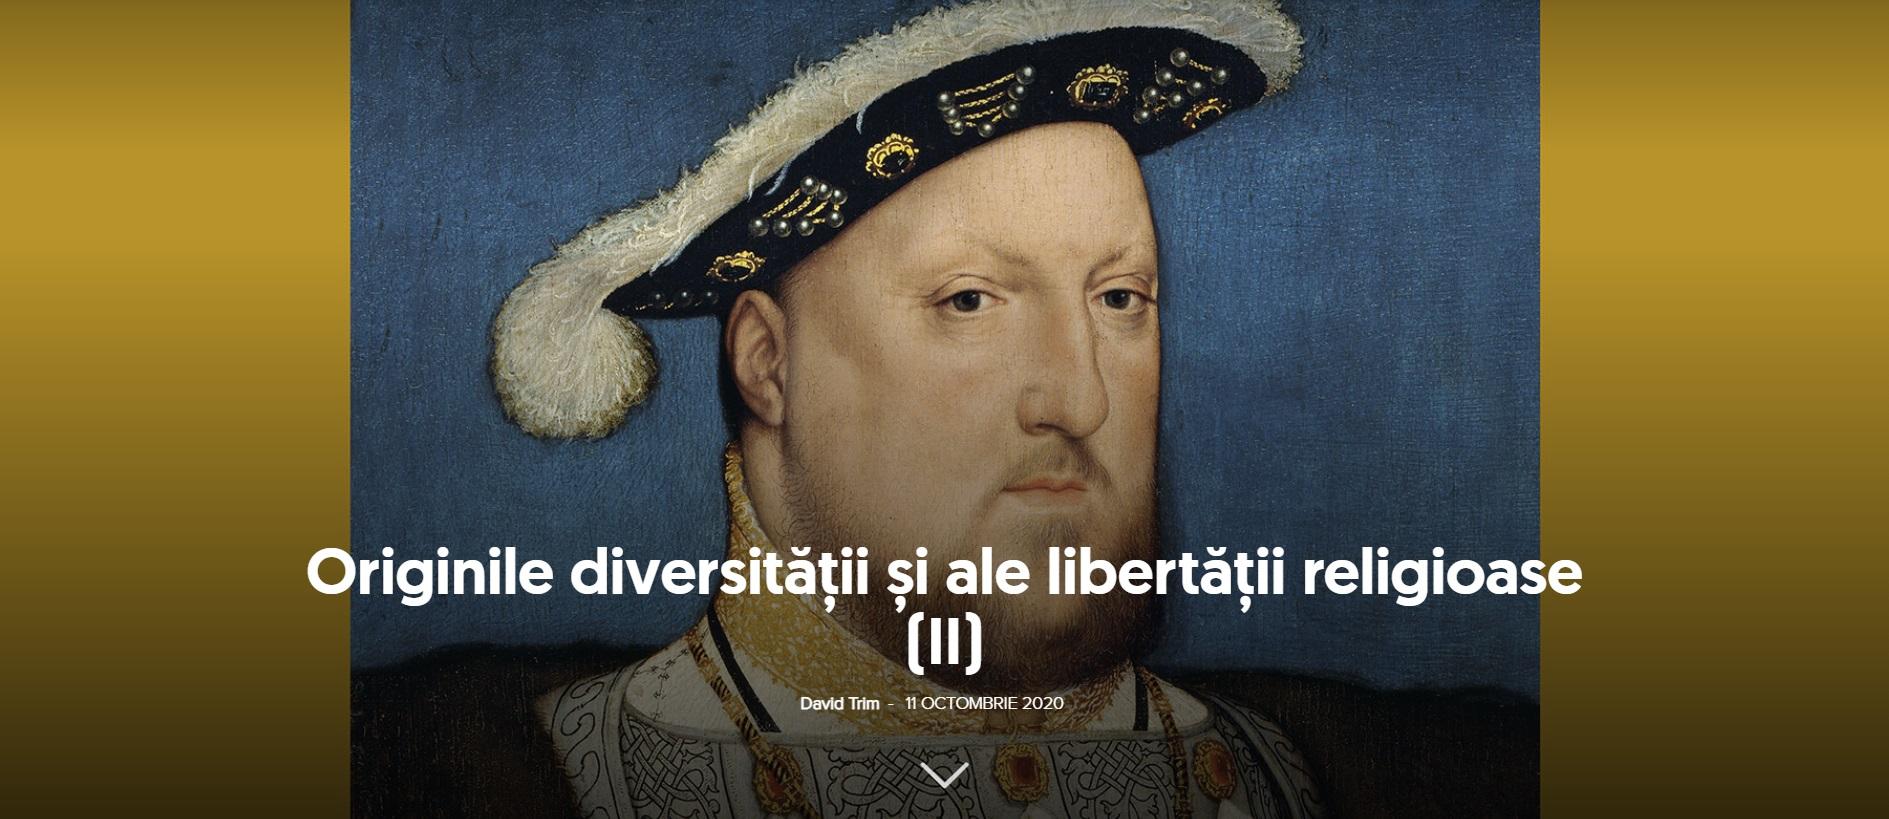 Regele Henric VIII. Originile diversitatii si ale libertatii religioase